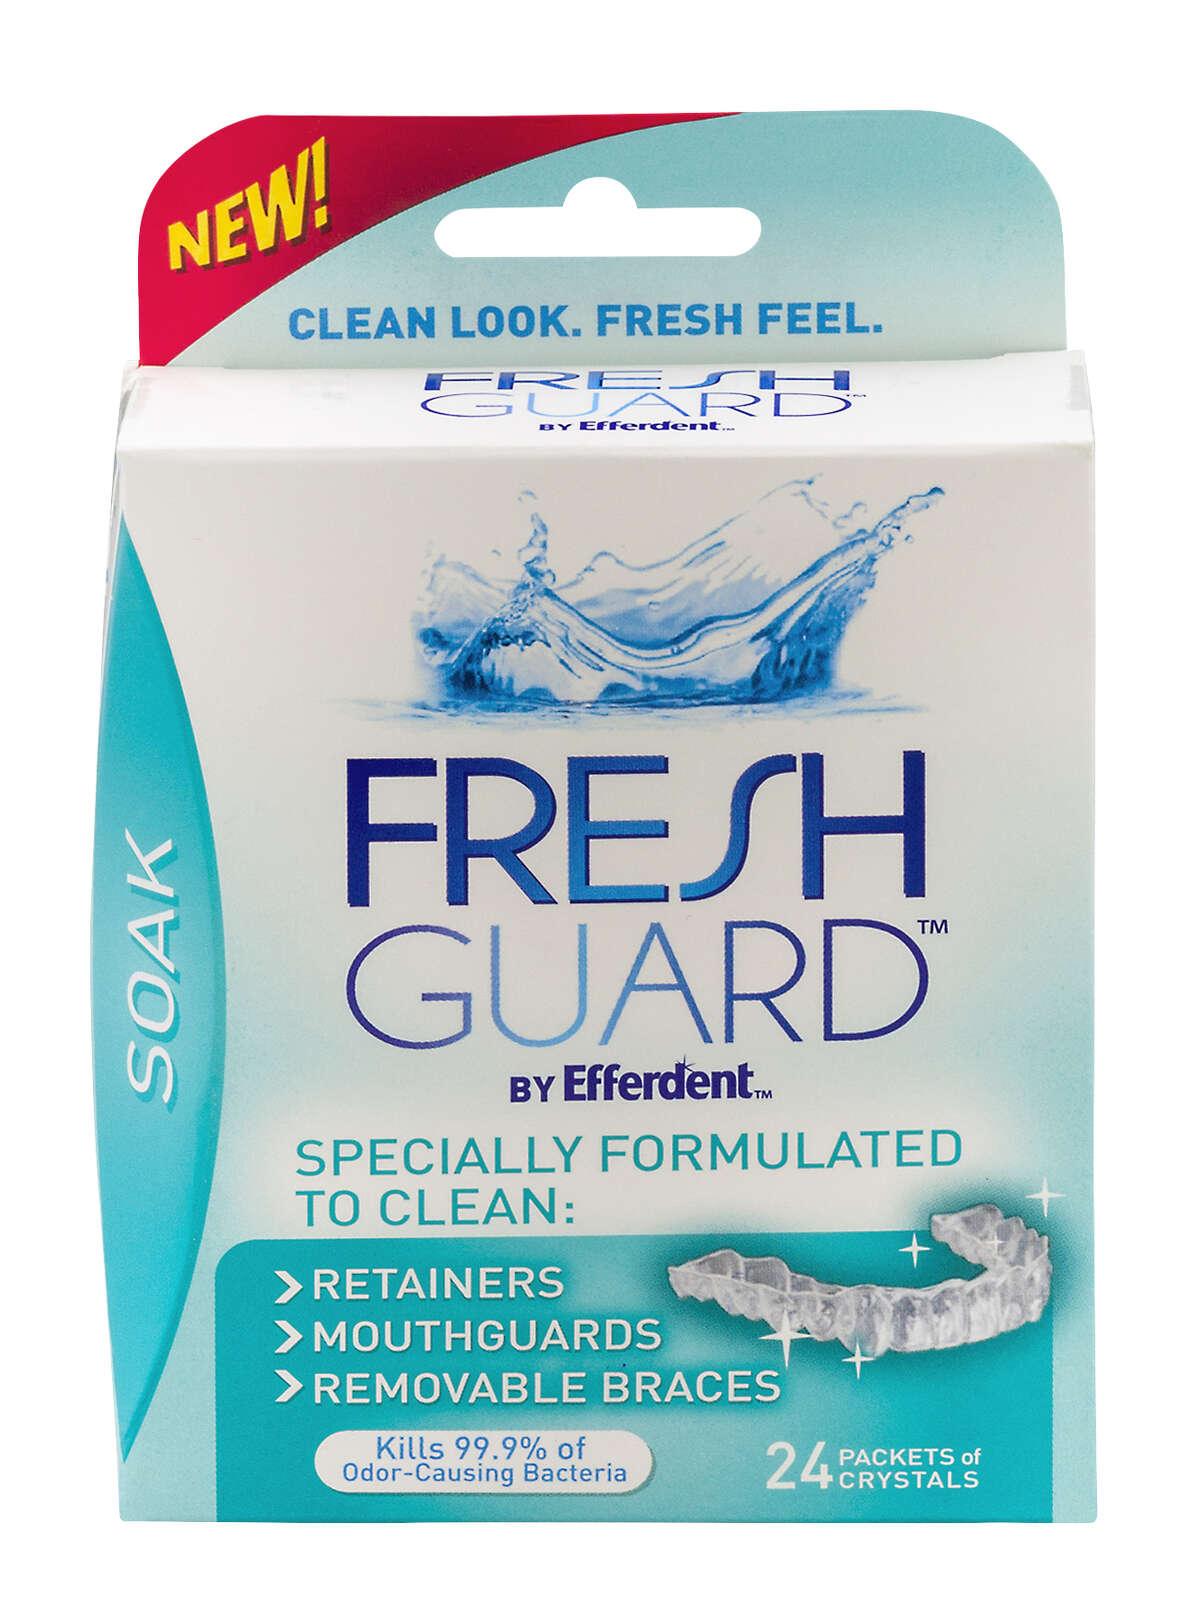 FreshGuard (Photo provided by Prestige Brands Holdings, Inc.)